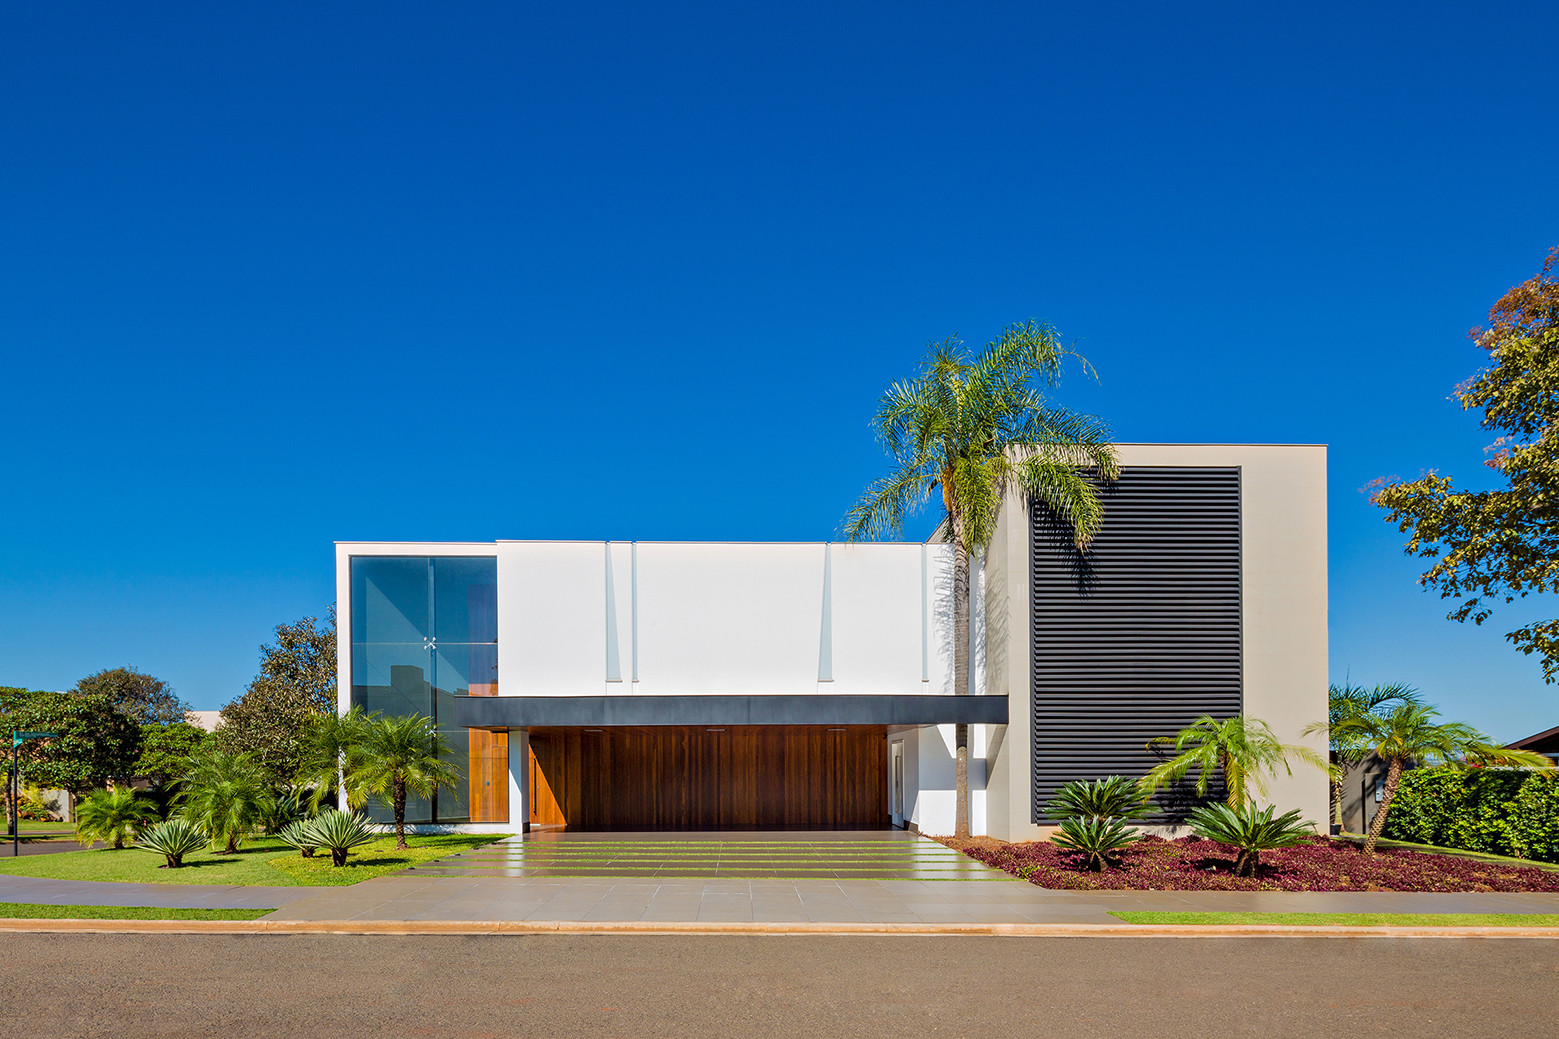 Jabuticaba House / Raffo Arquitetura, © R.R.Rufino